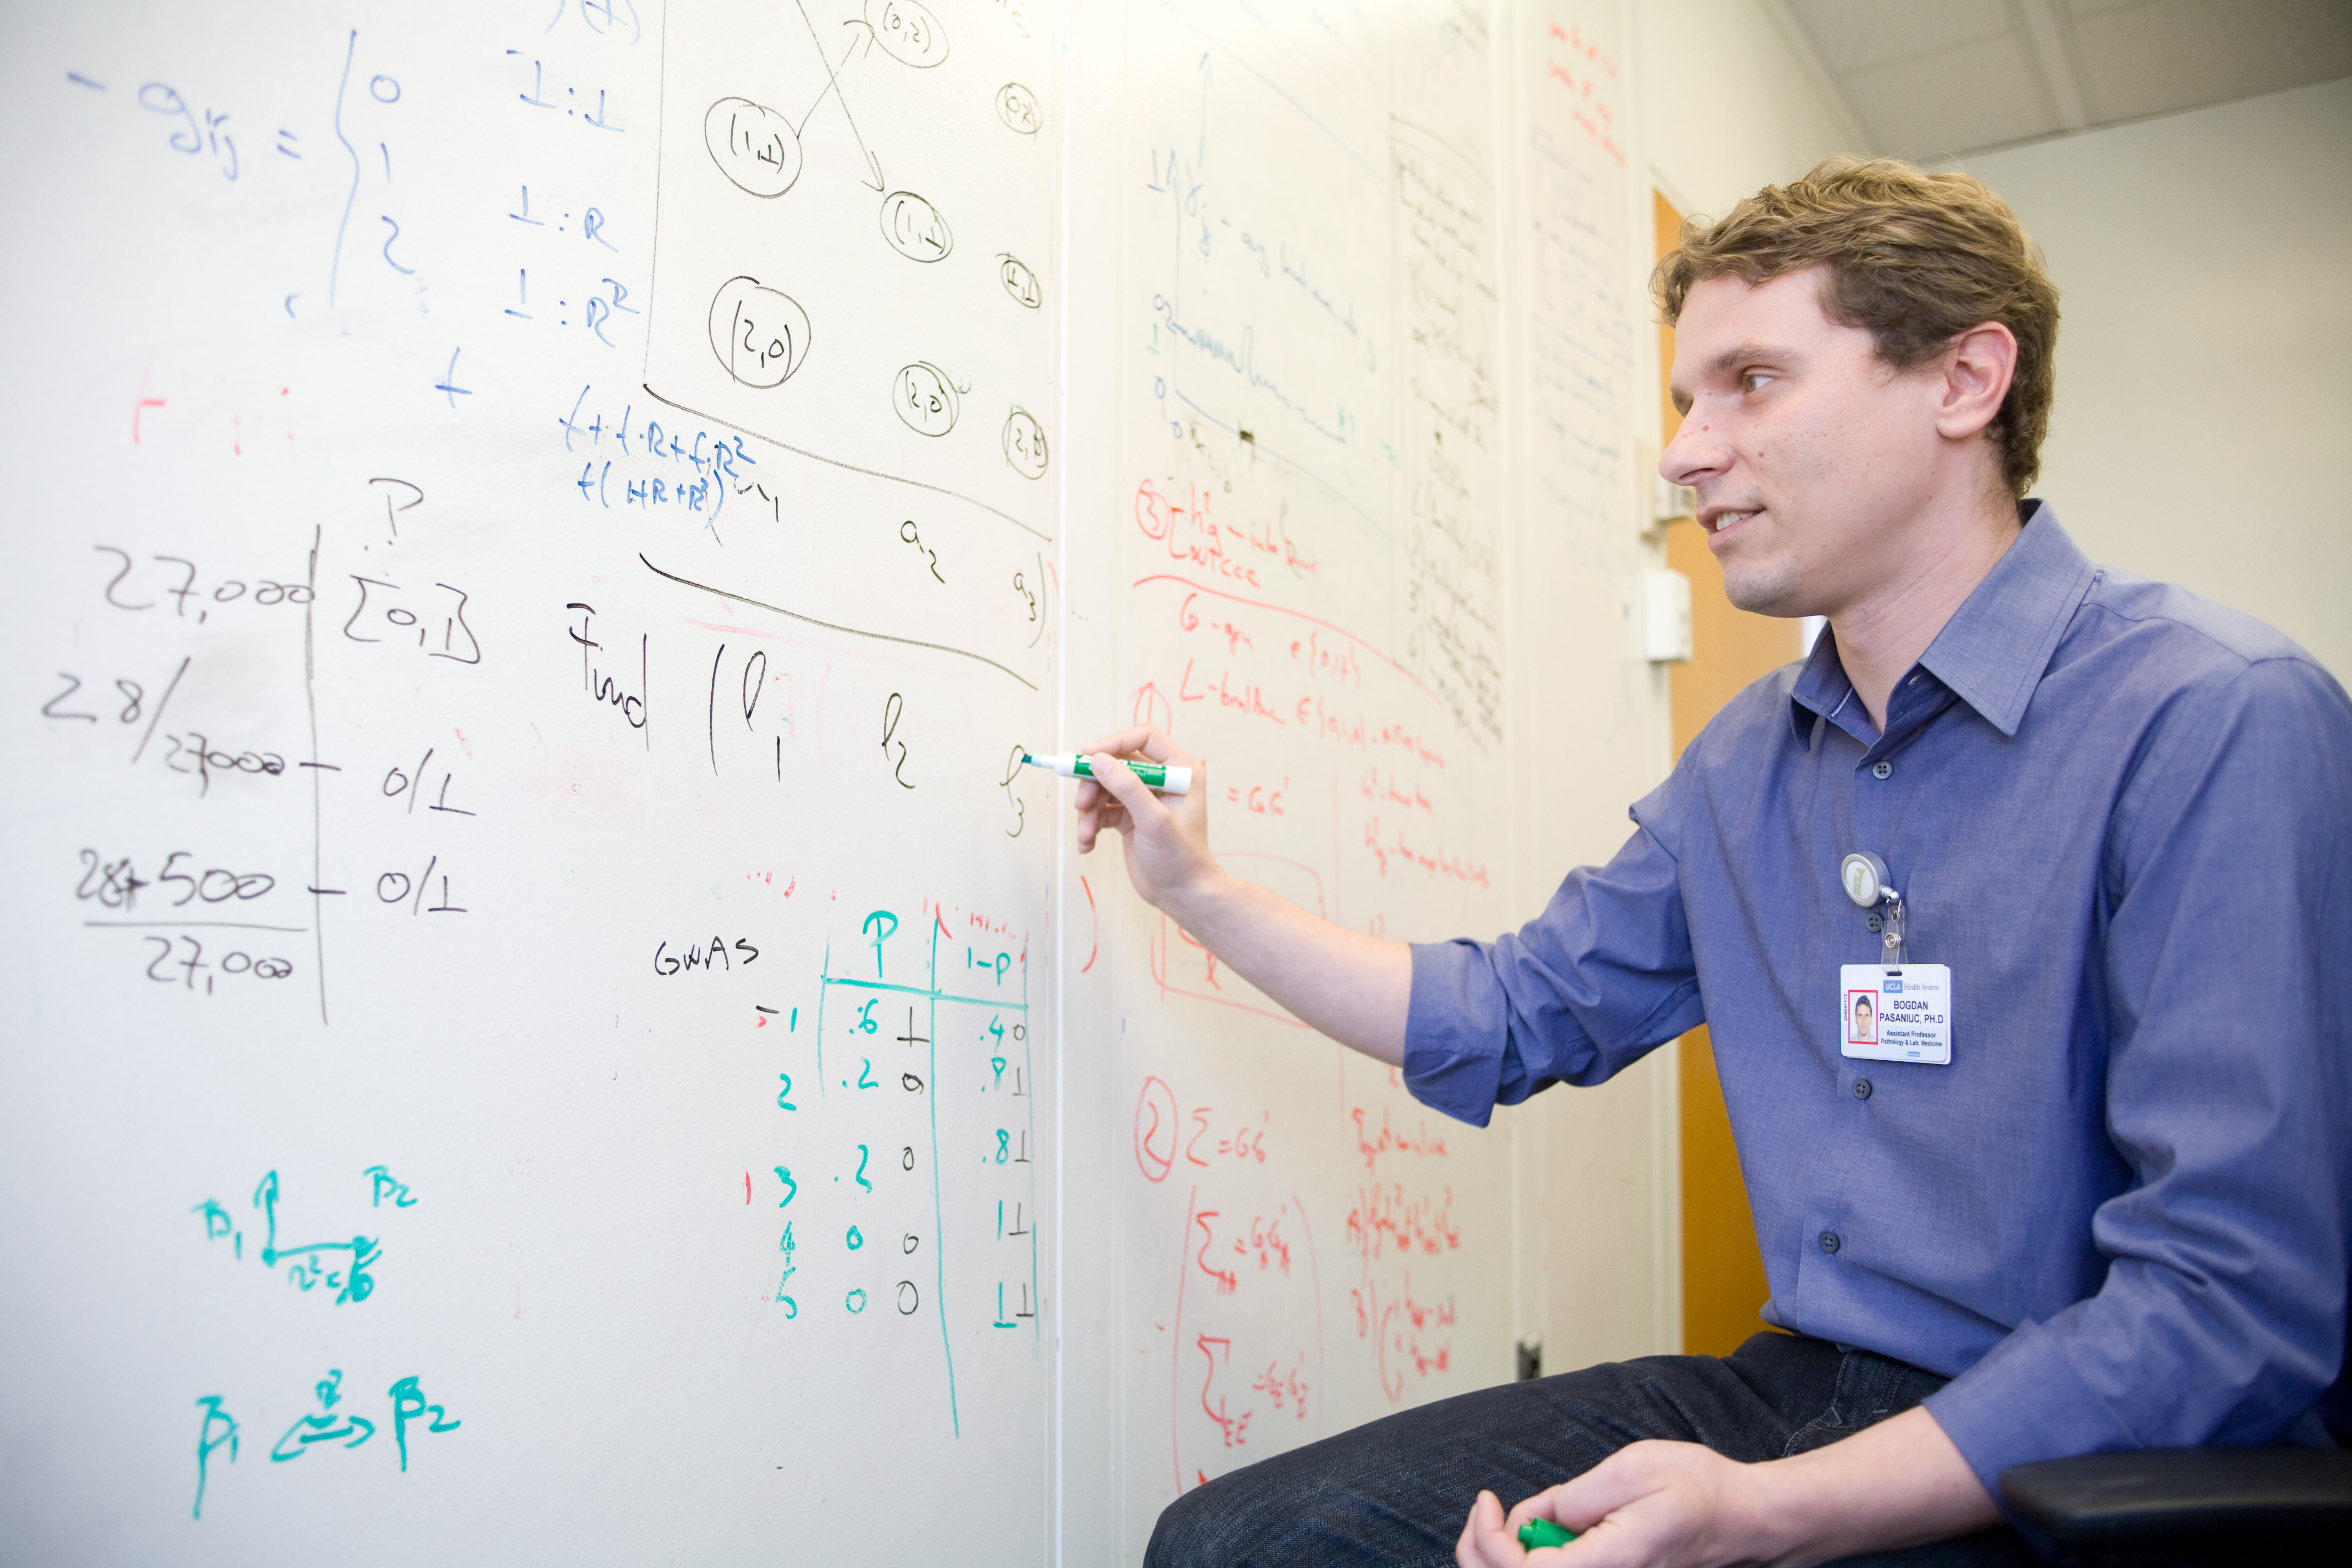 UCLA researchers study genetics' role in COVID-19 susceptibility, severity